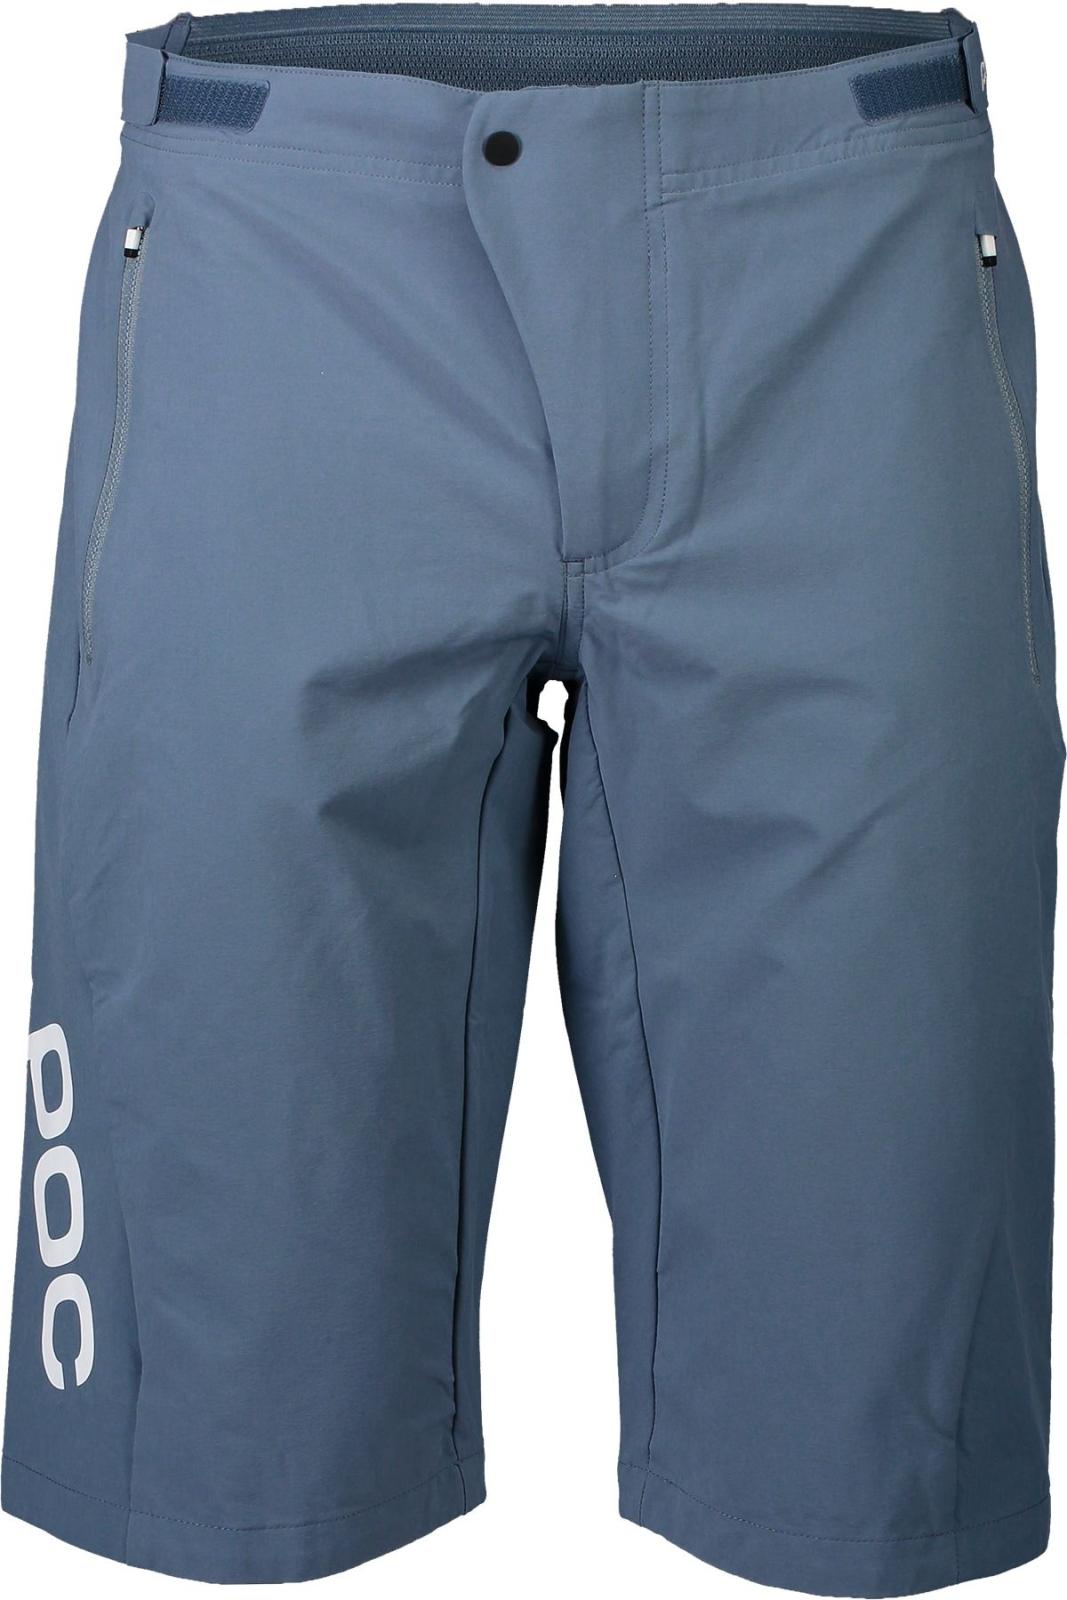 POC Essential Enduro Shorts - Calcite Blue XXL